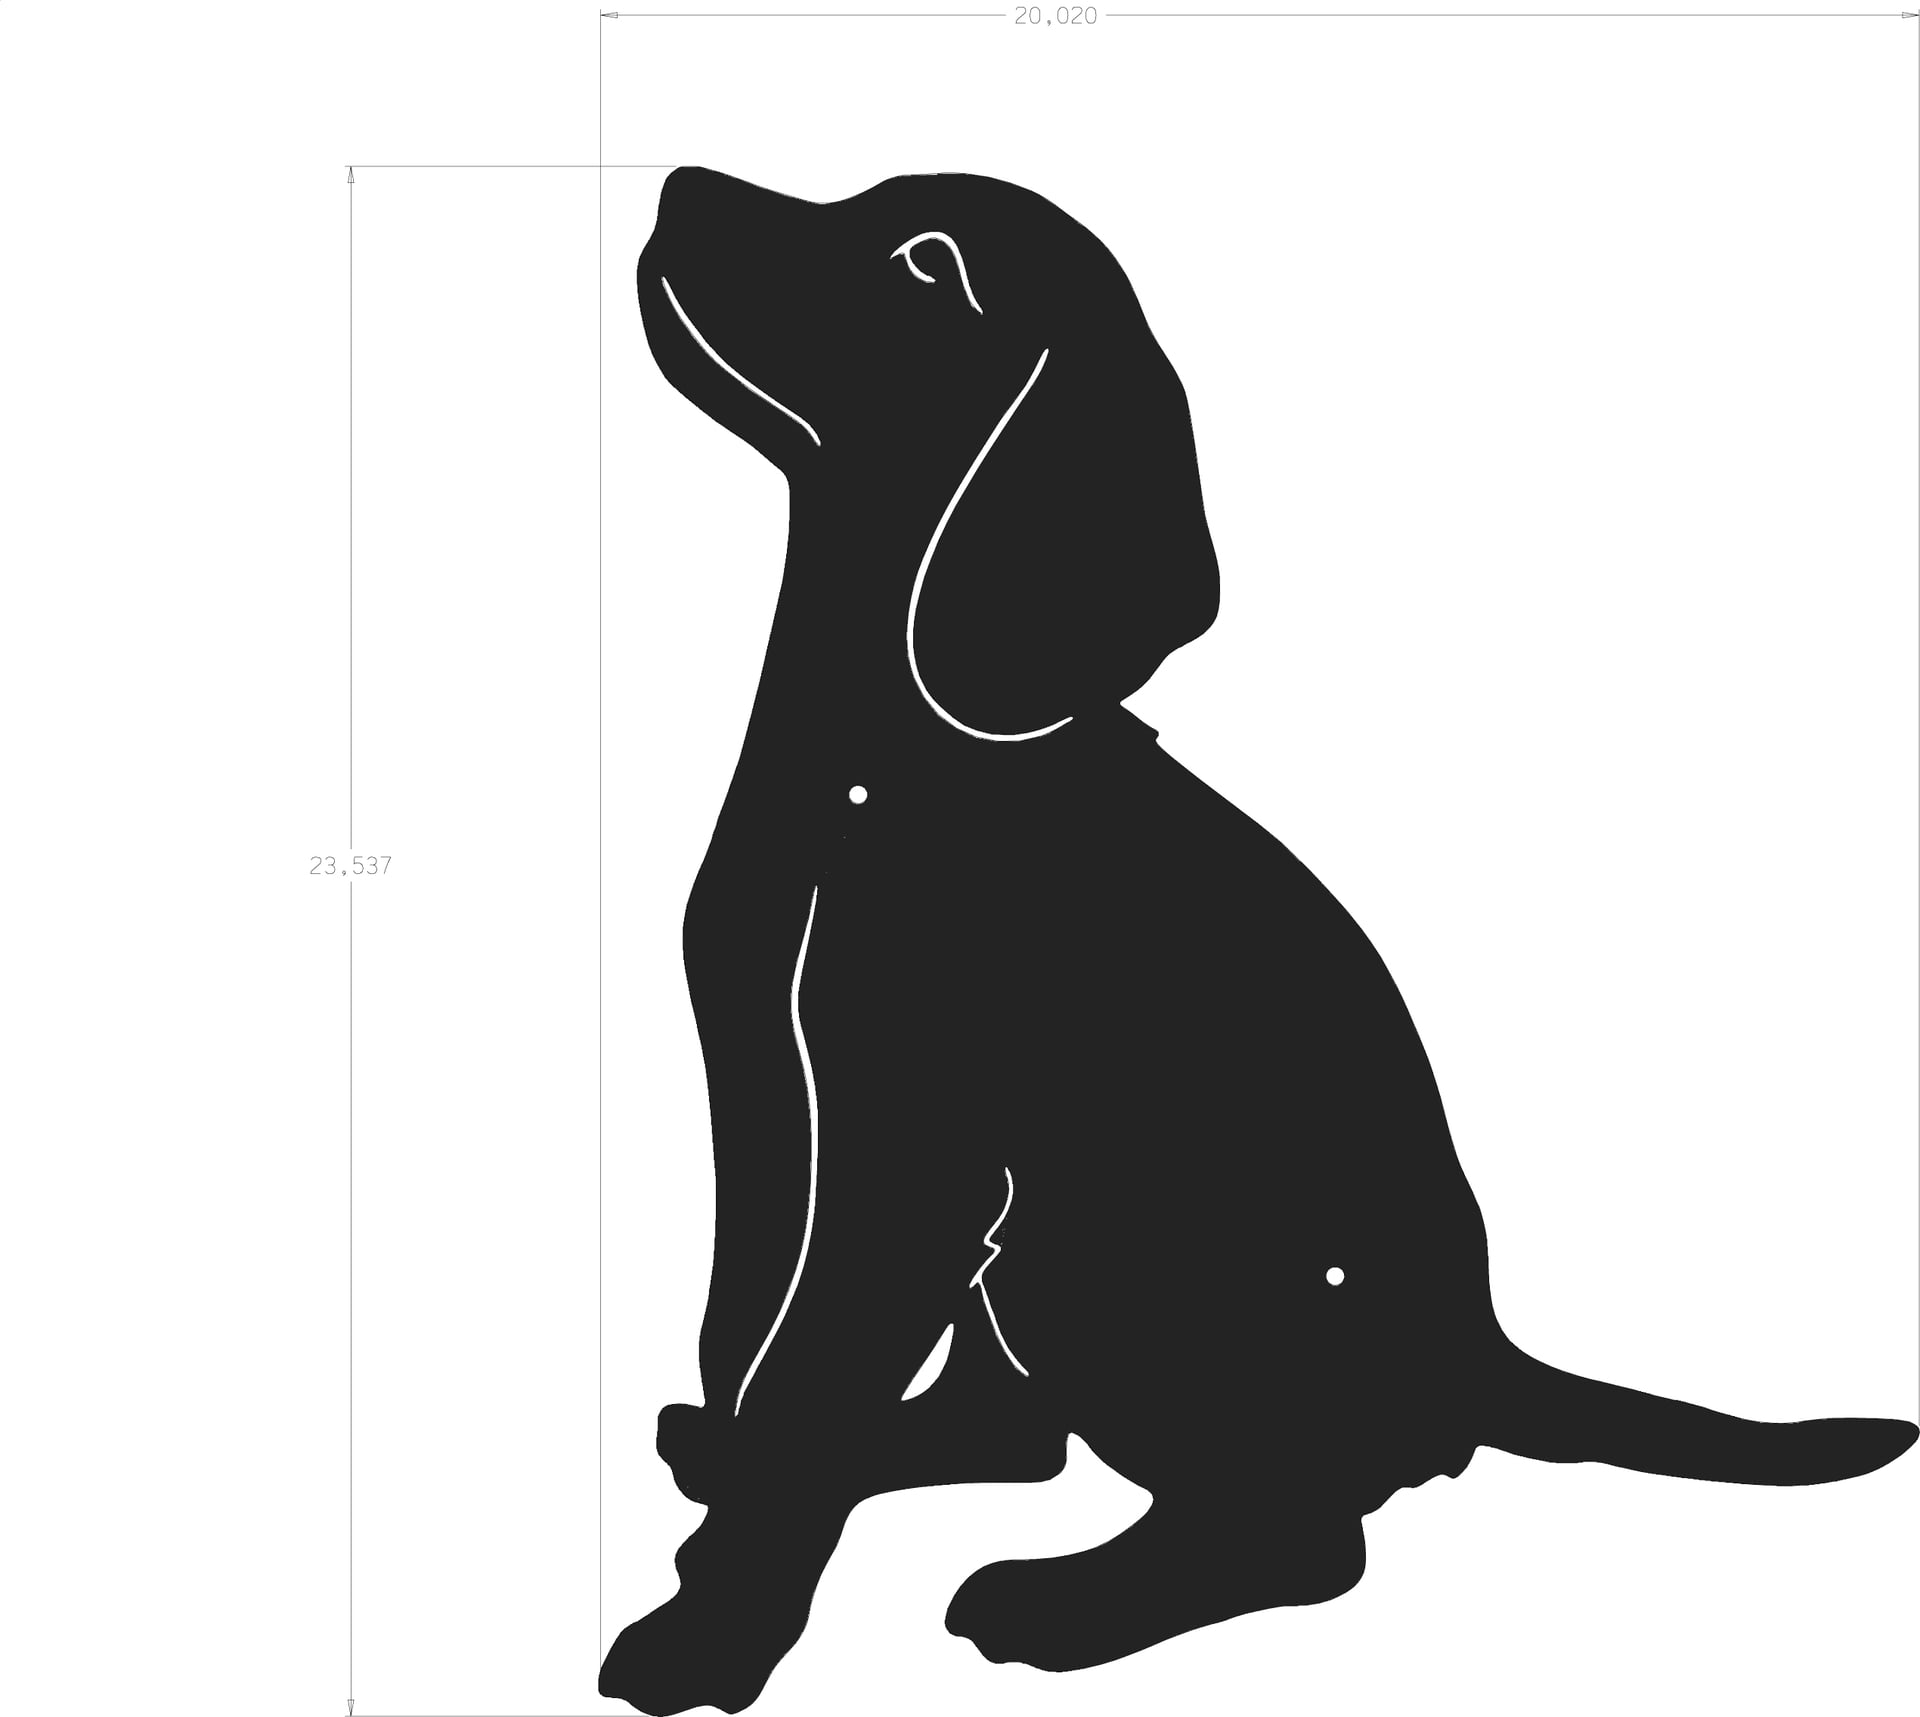 Dog sitting silhouette